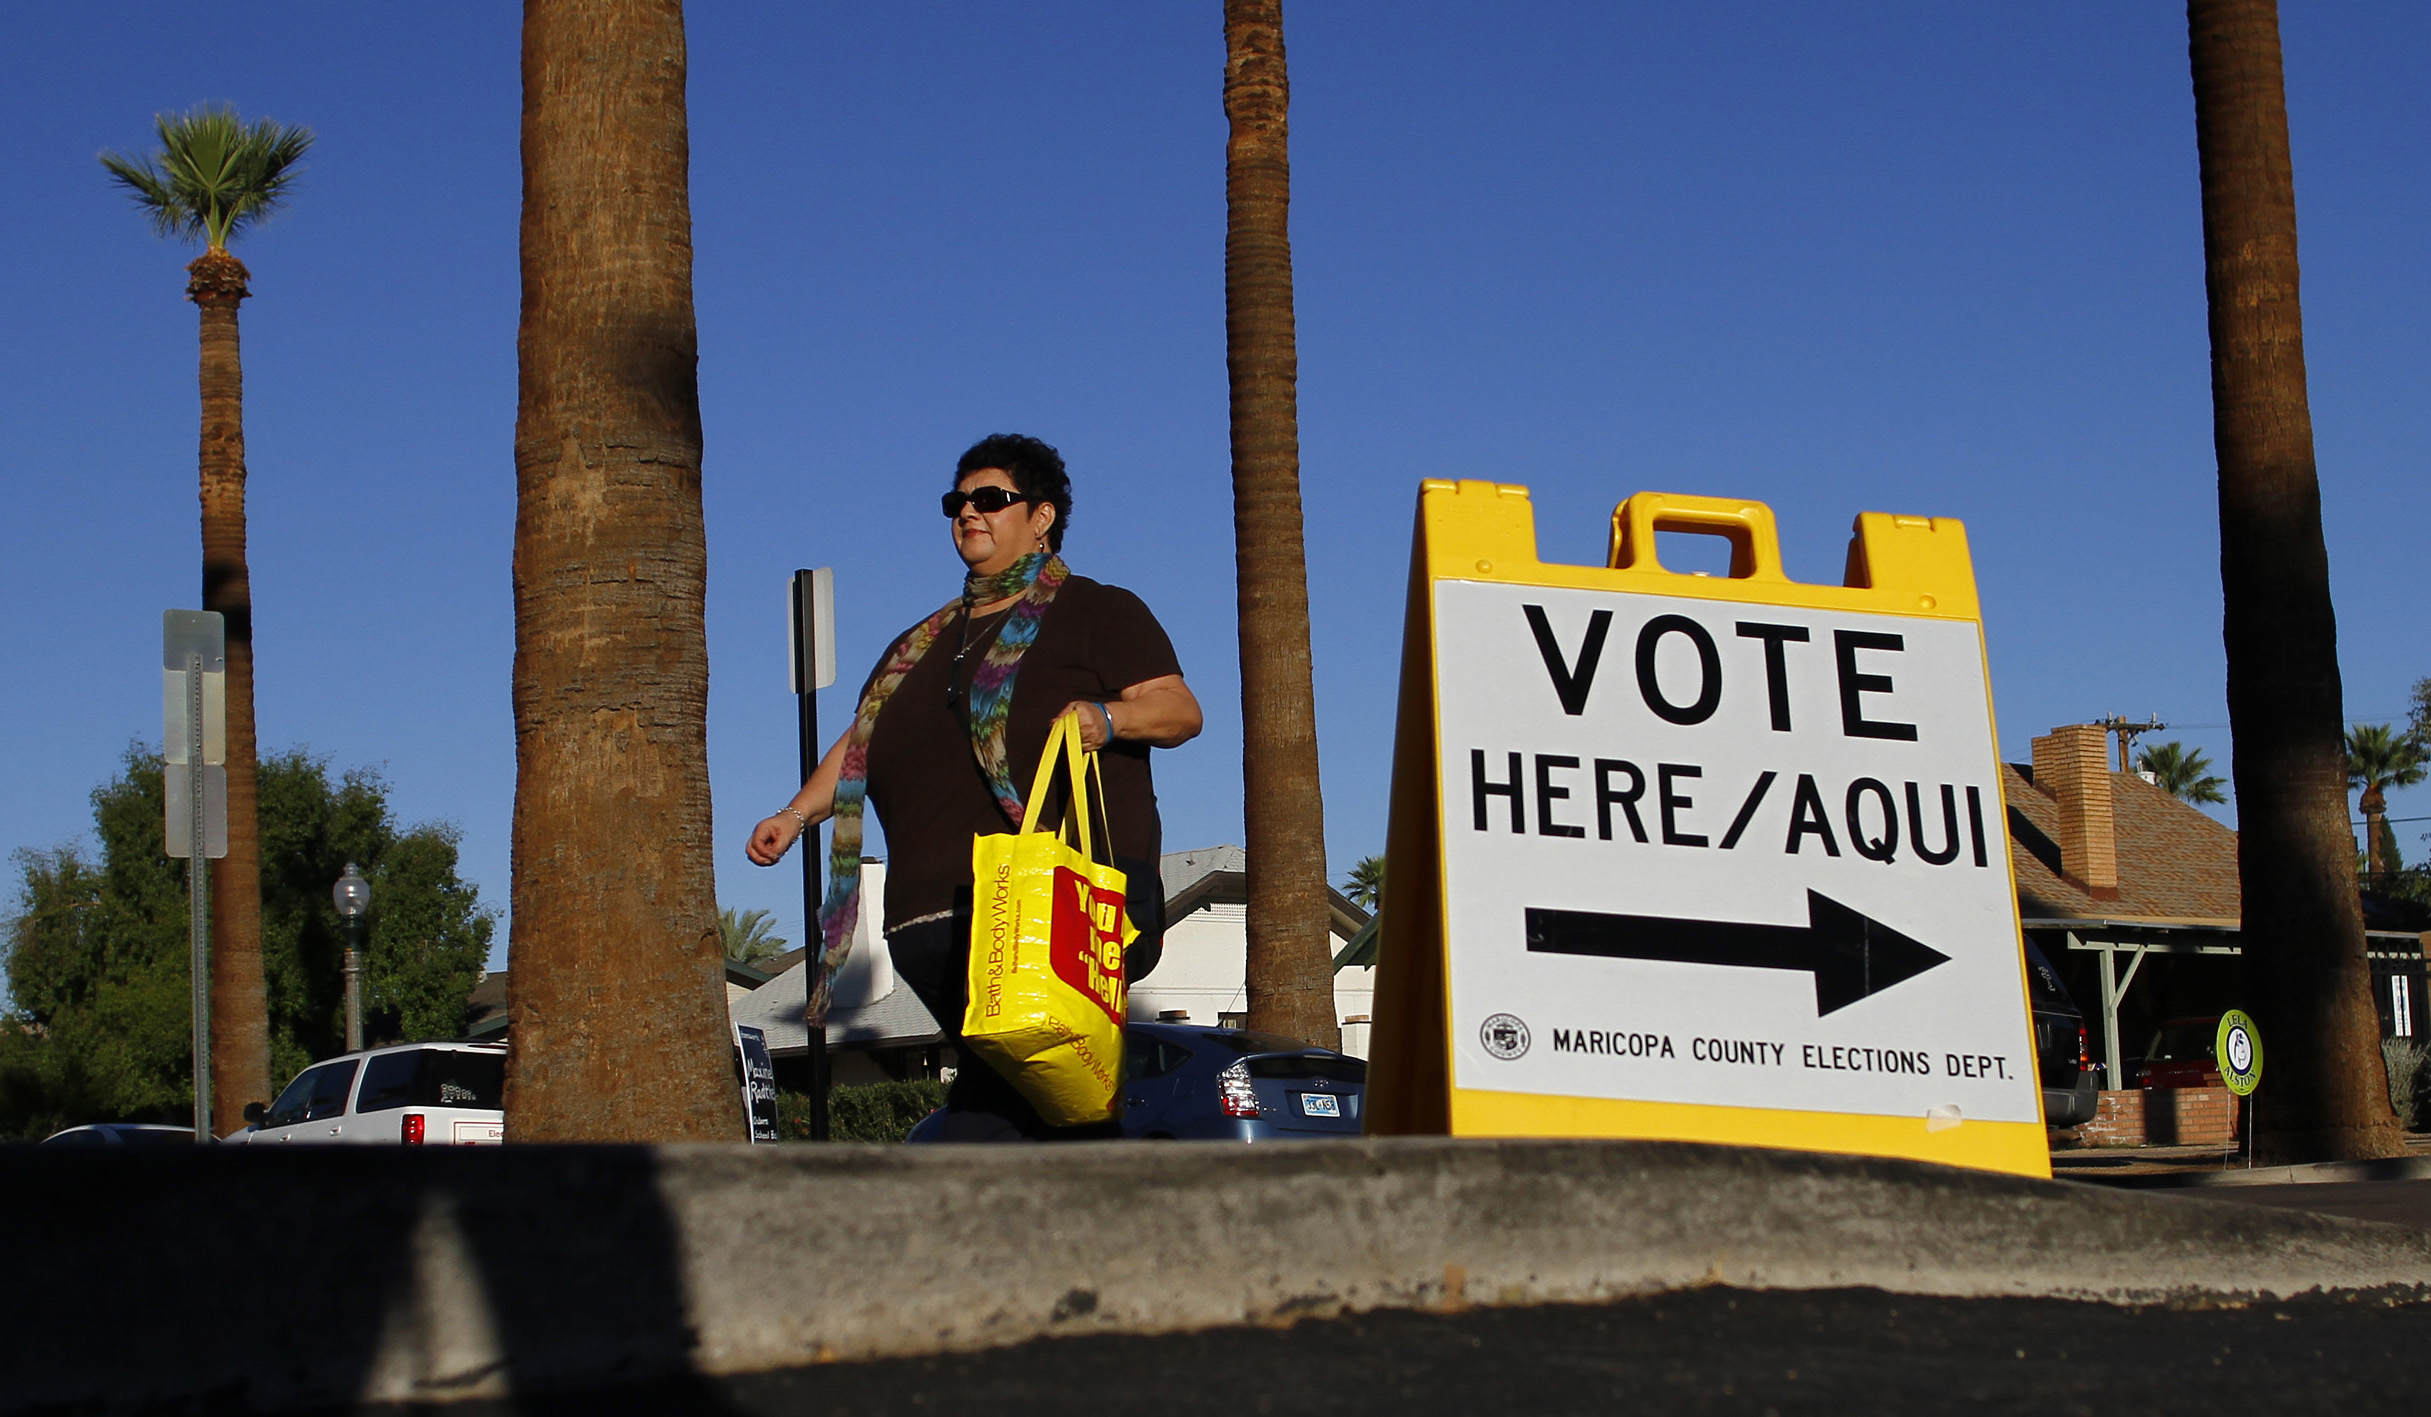 Woman walks past voter sign